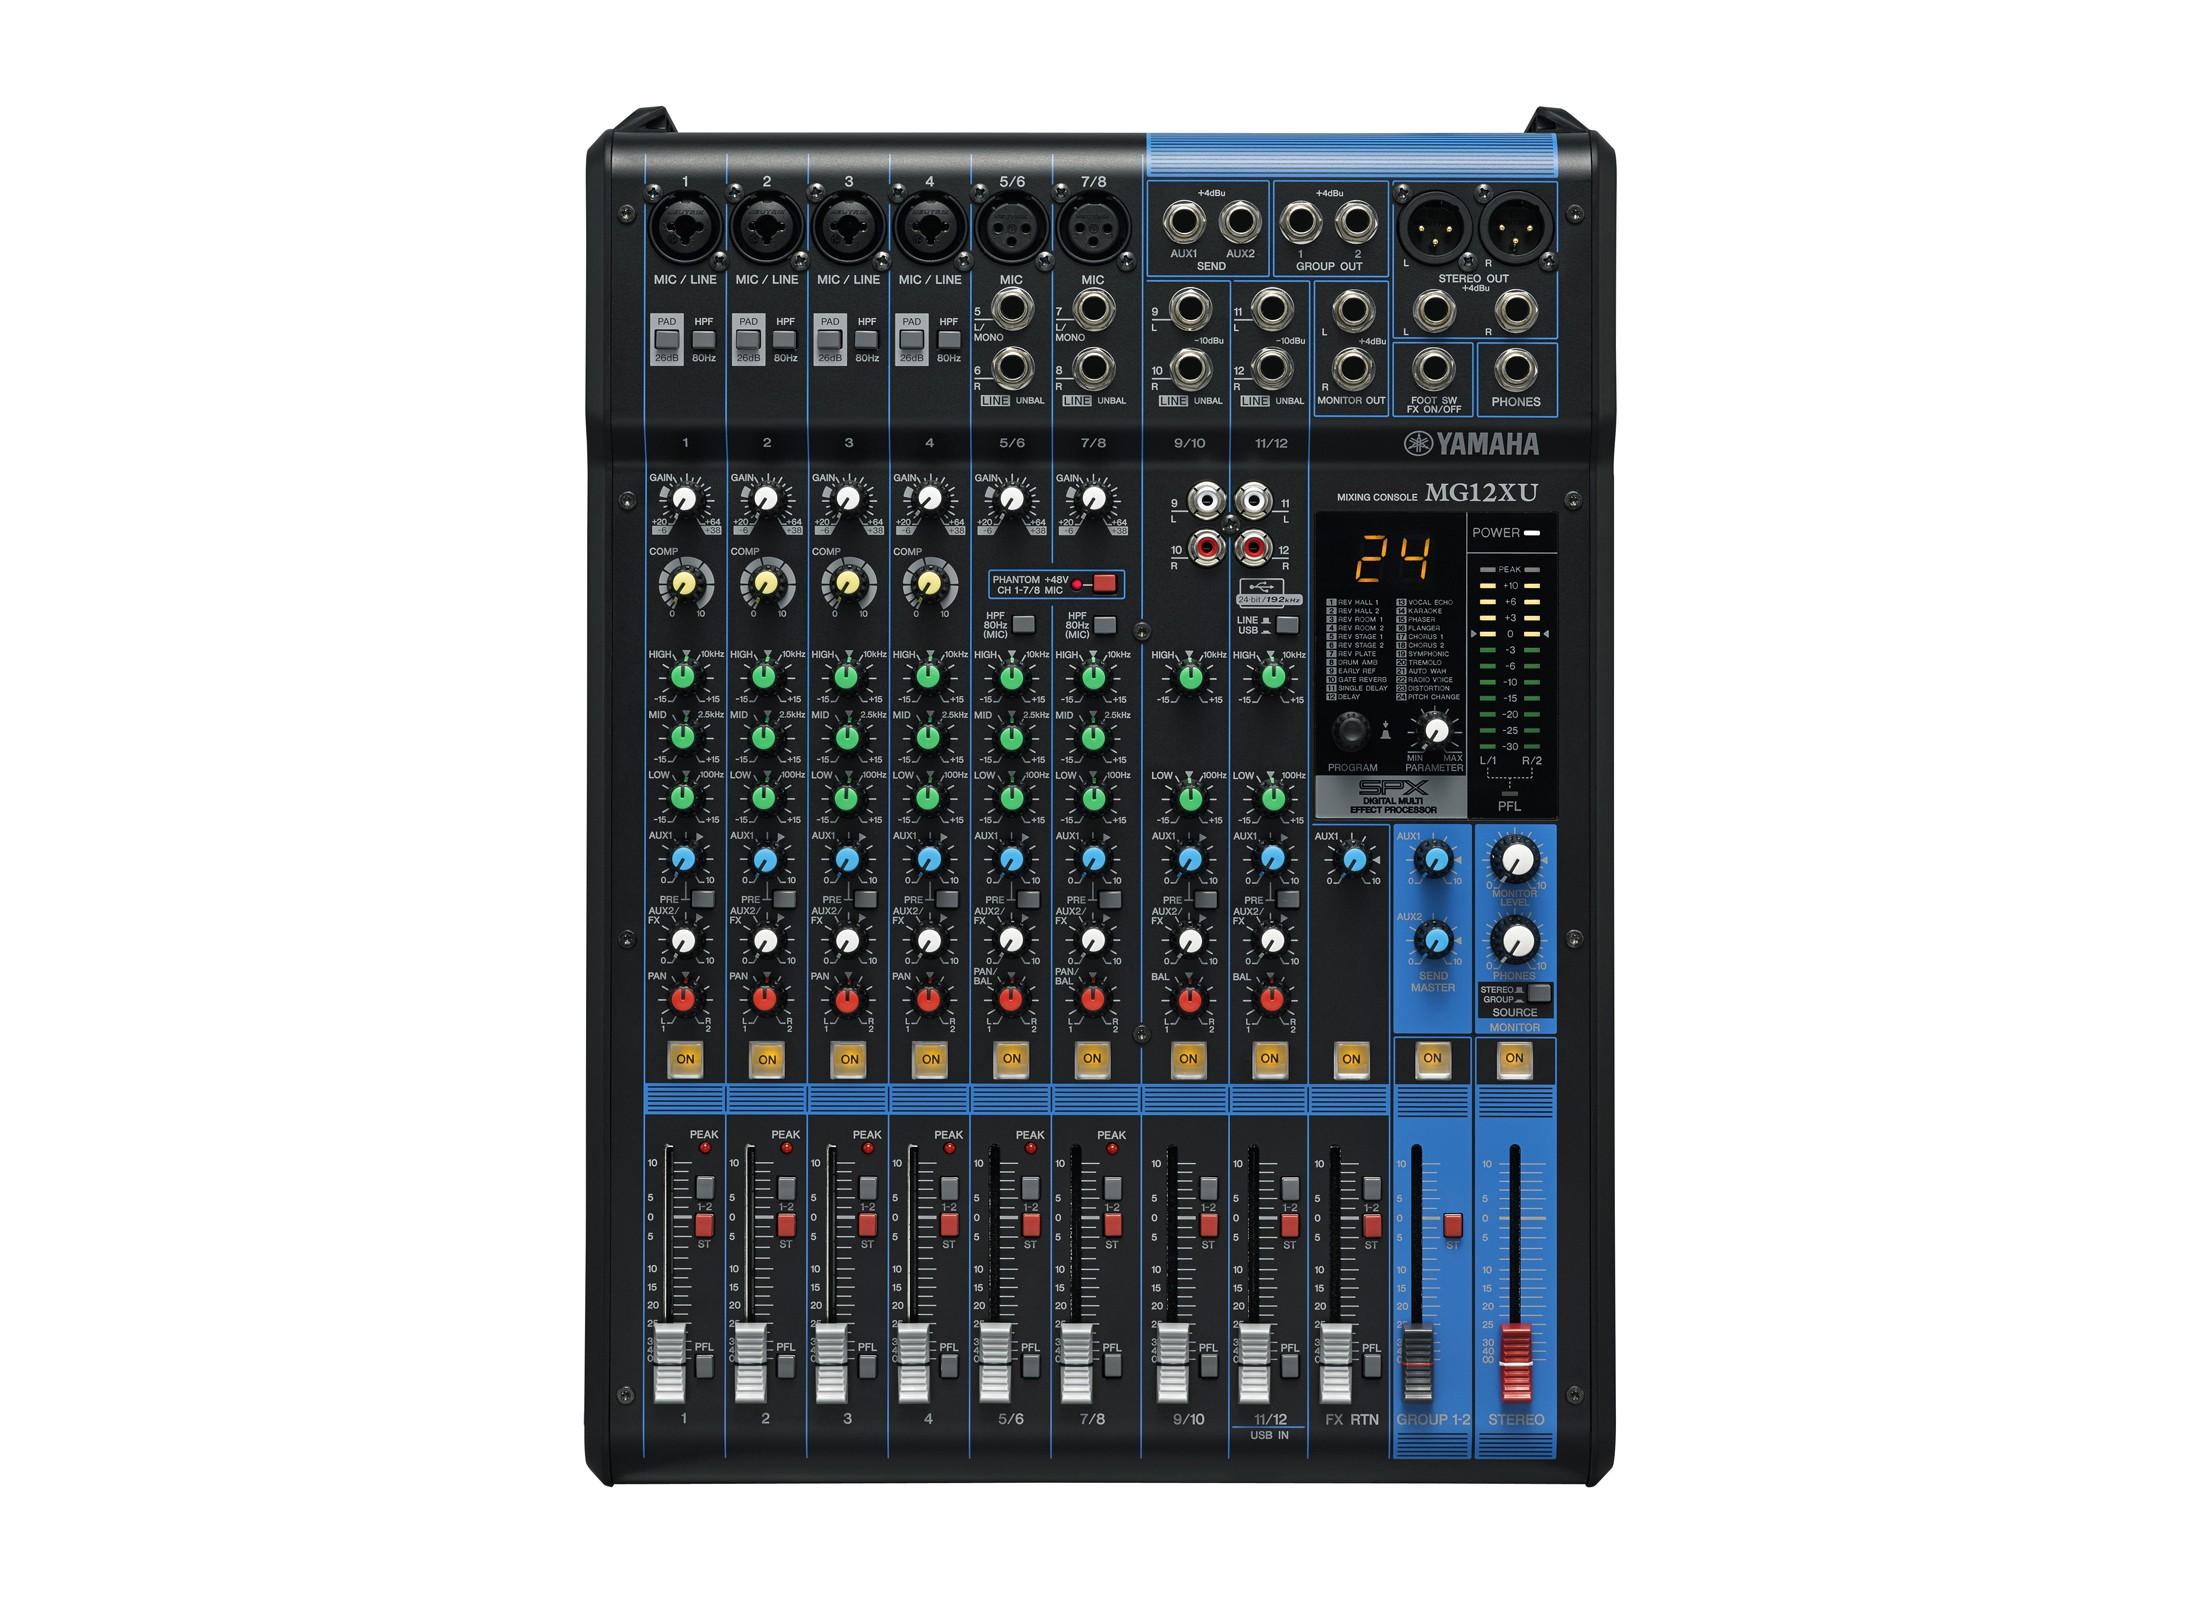 Yamaha Mg 12xu Compact Mixer Online At Low Prices At Huss